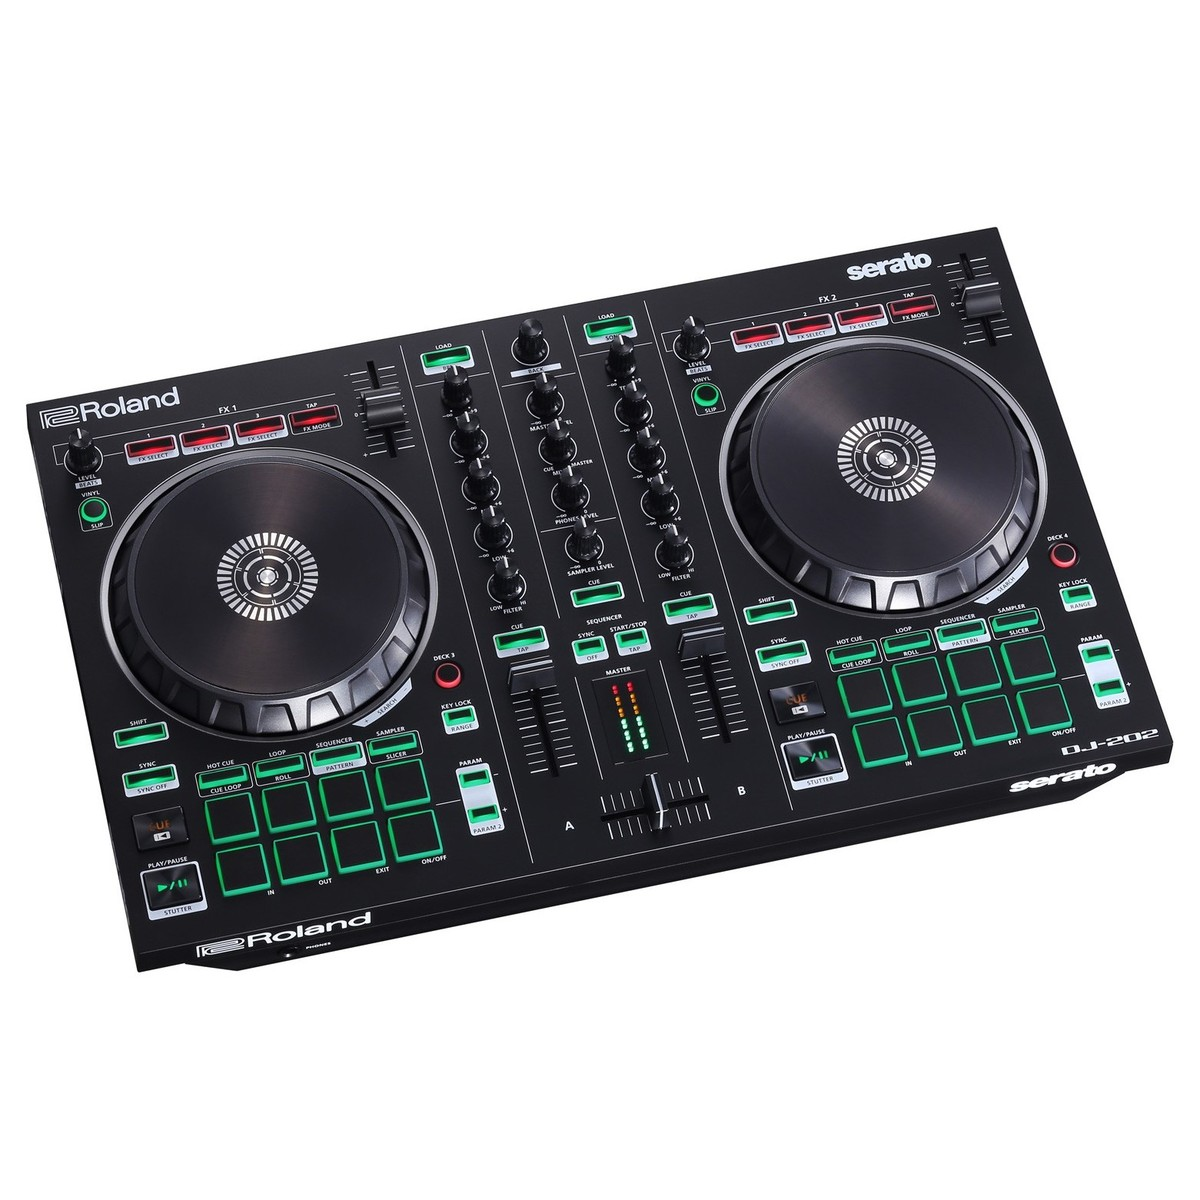 SHOP NOW | DJ Gear